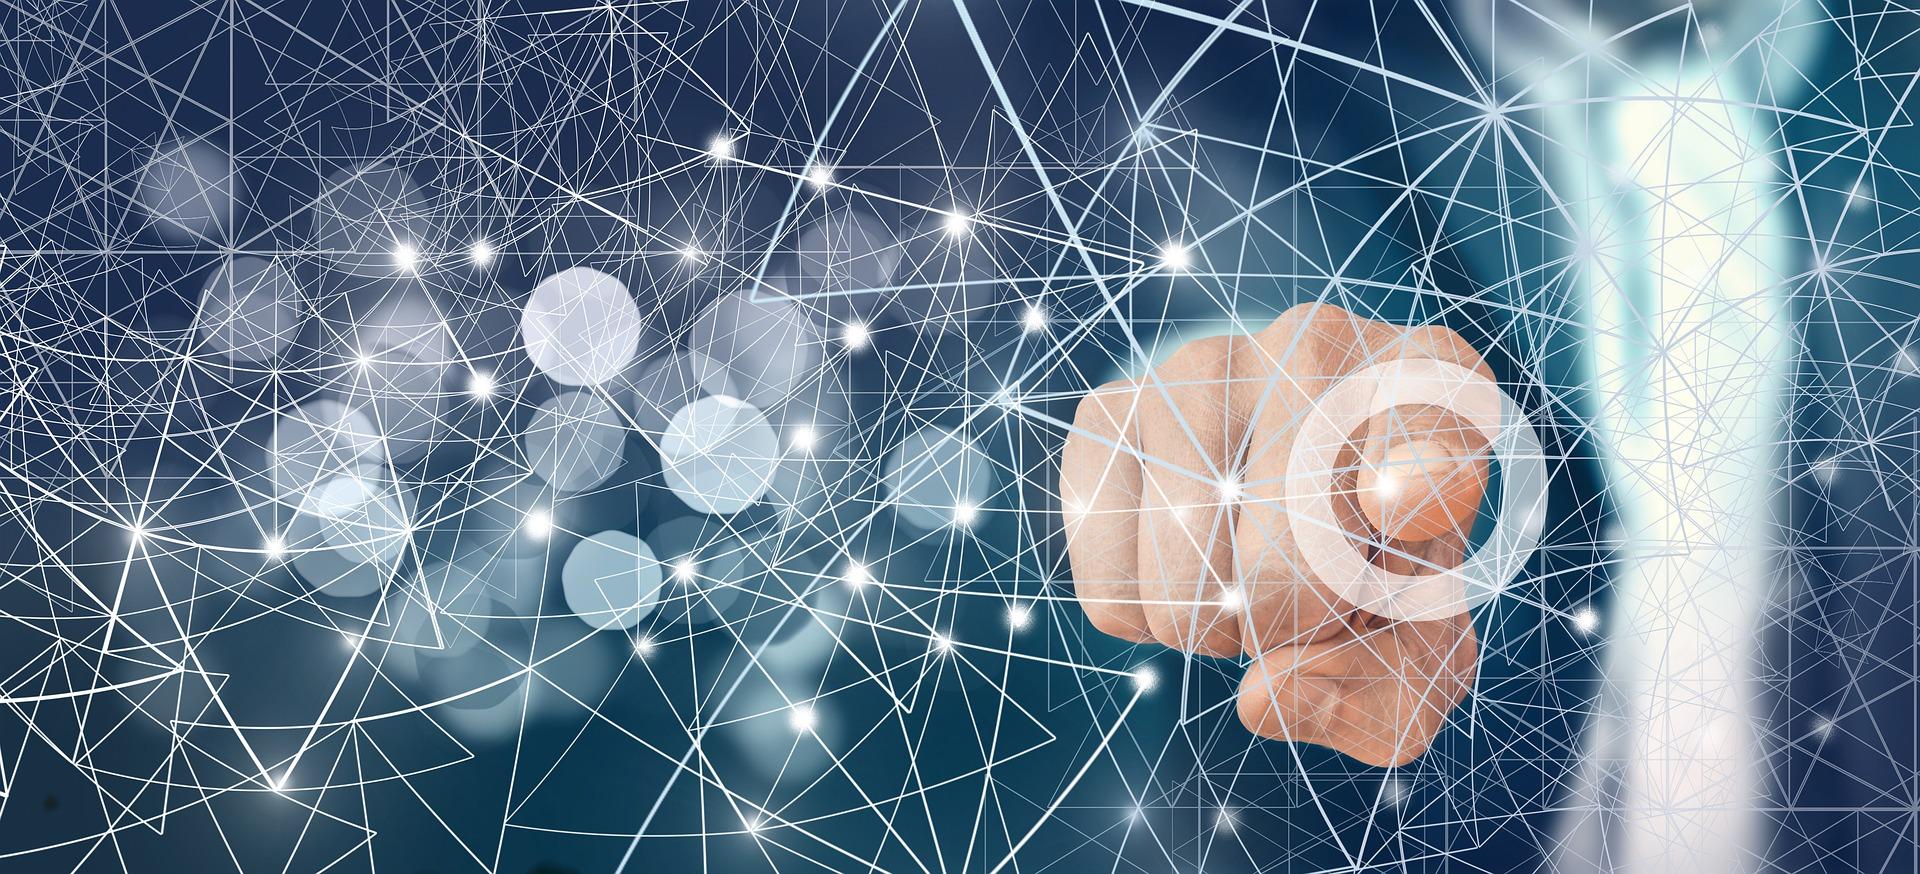 Login VSI Named as a Technology Innovator by the Digital Enterprise Journal